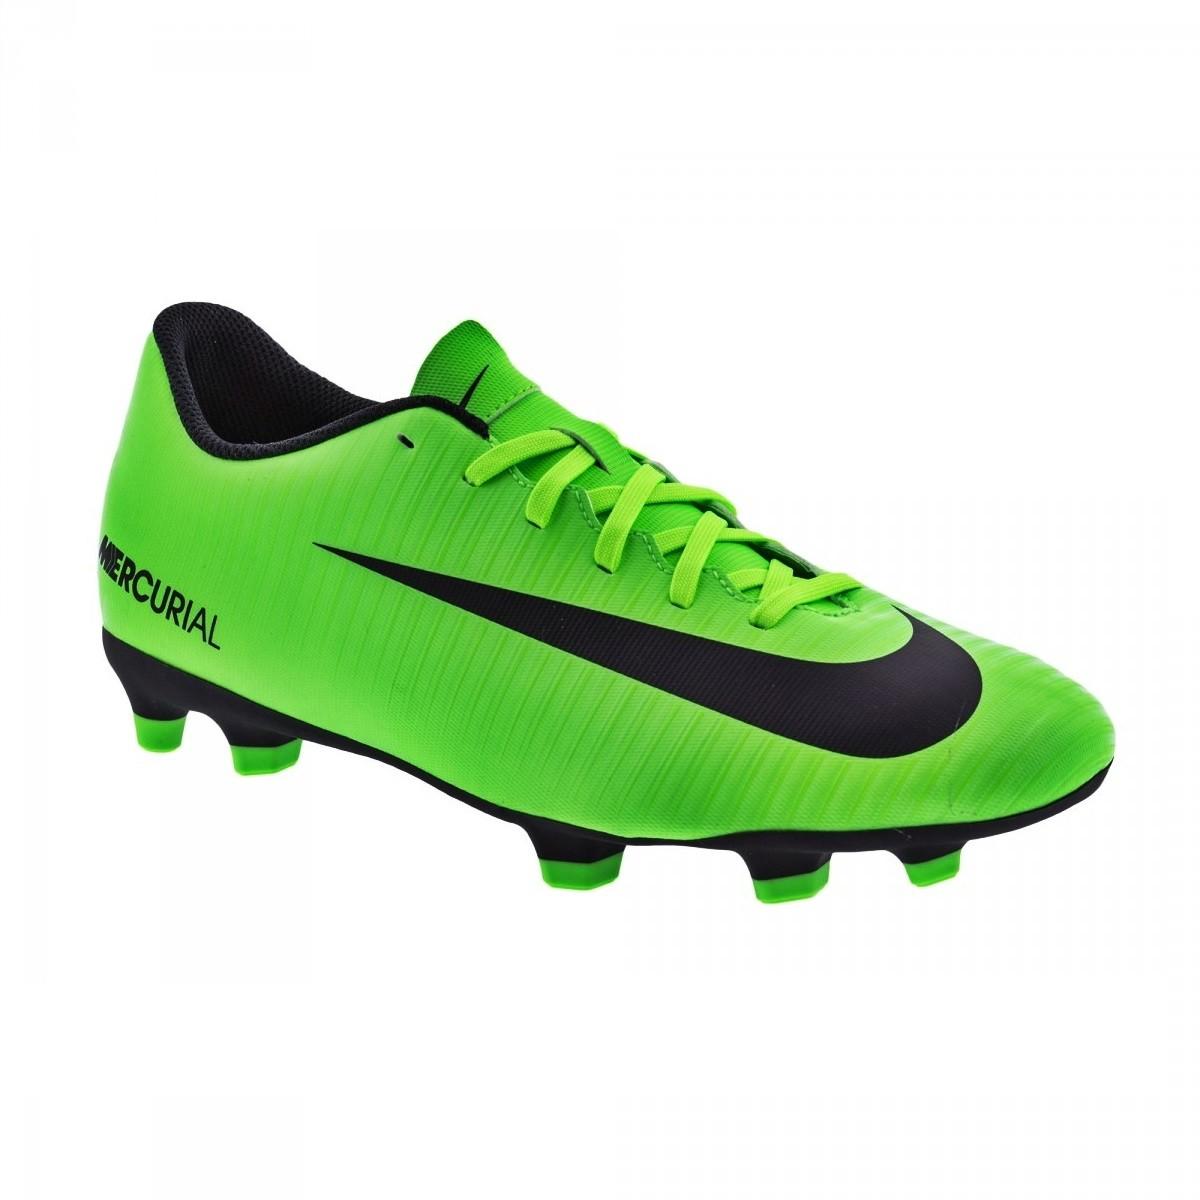 40ebc9a1e4 ... Worldwide Online Retailer List Chuteira Campo Nike Mercurial Vortex III  FG ...